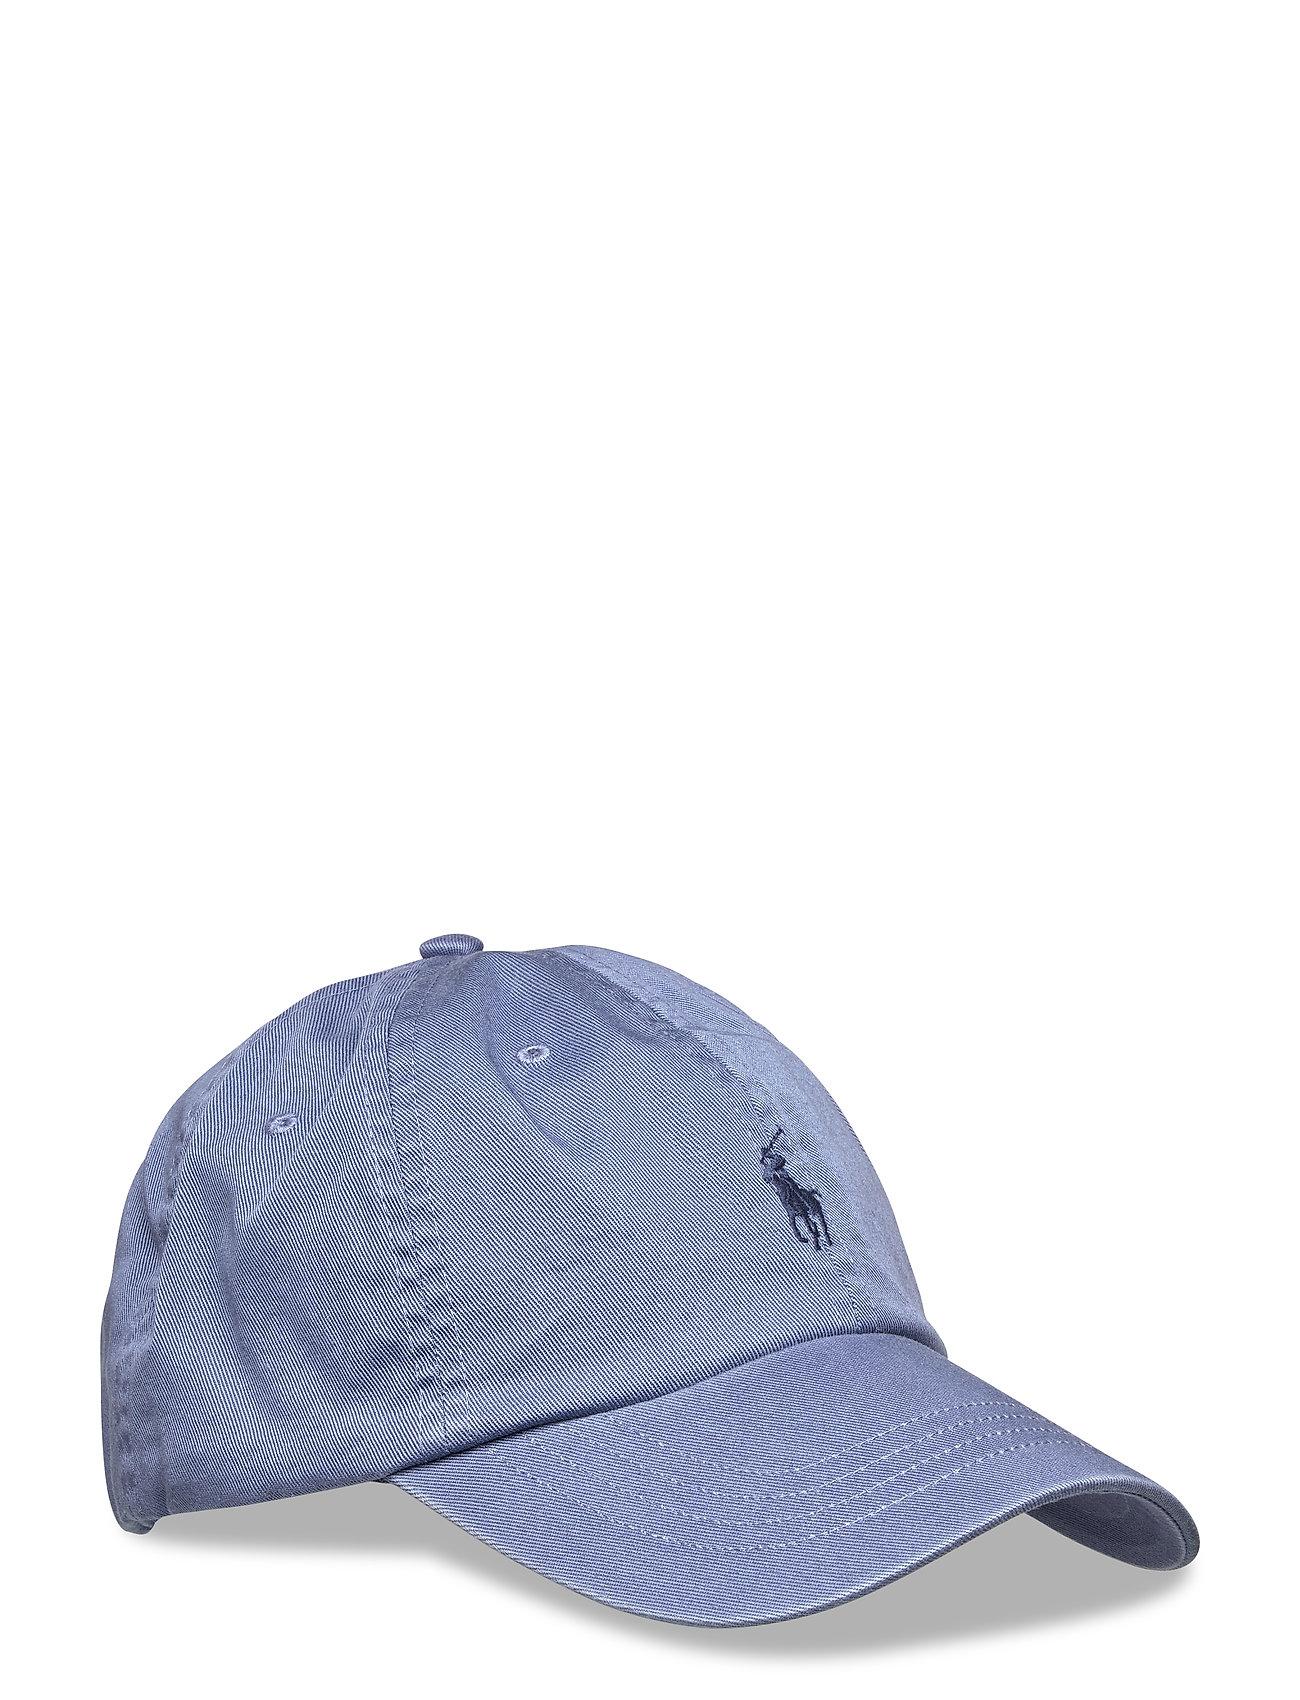 Cotton Chino Baseball Cap (Carson Blue adiro) (£35) - Polo Ralph ... 7686d993fc0